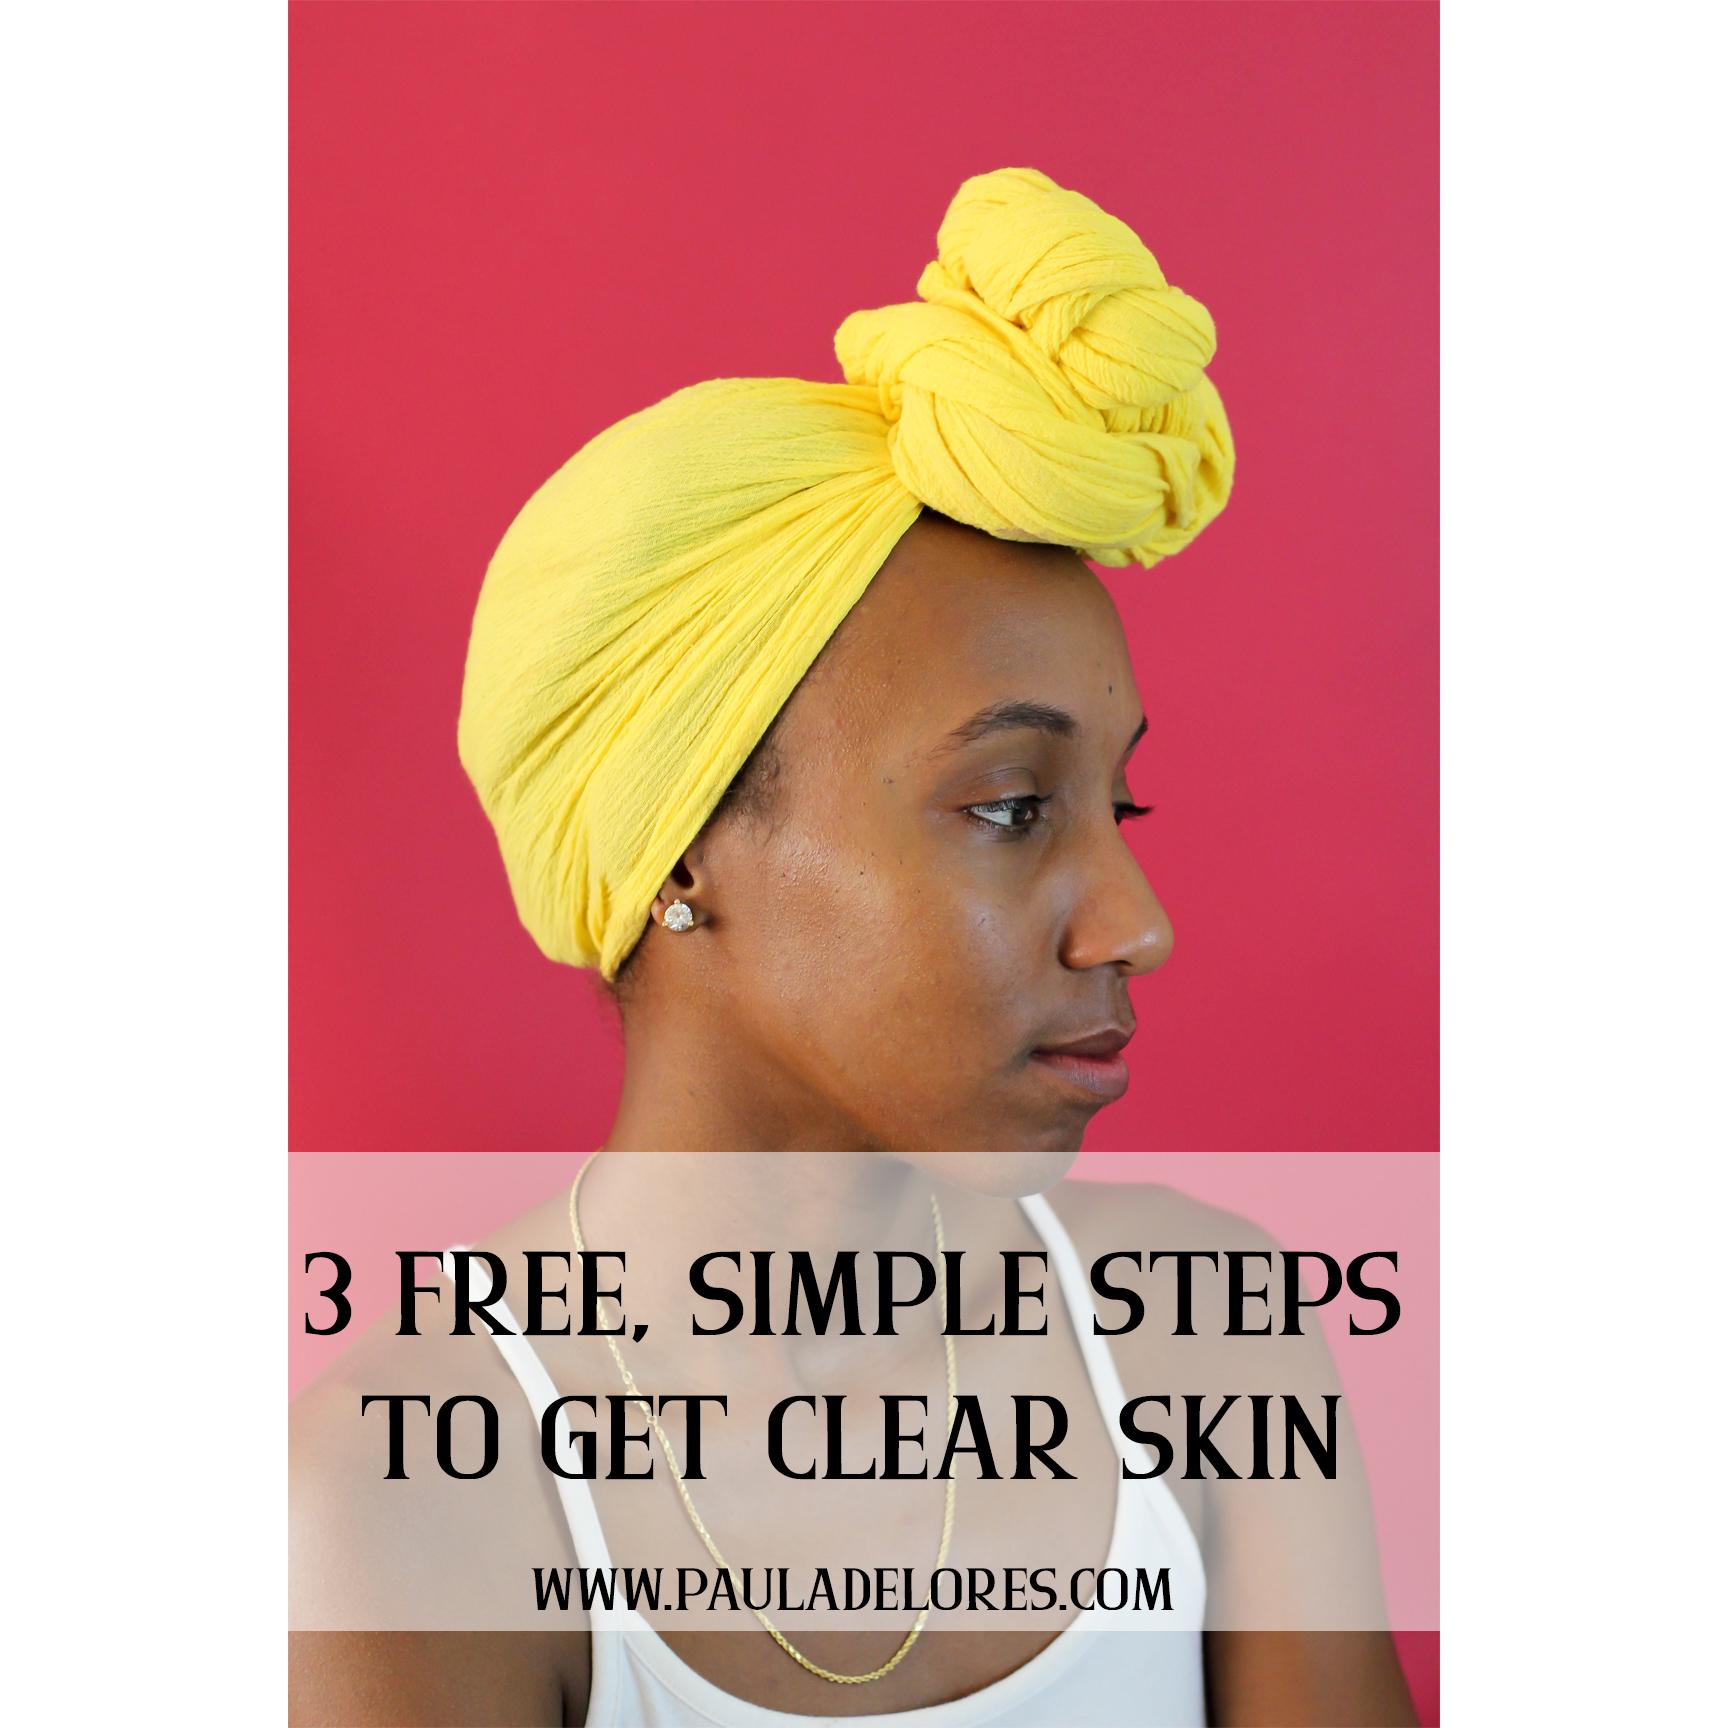 3 Free, Simple steps to get clear skin #clearskin #acneprone #healthandbeauty #skincare